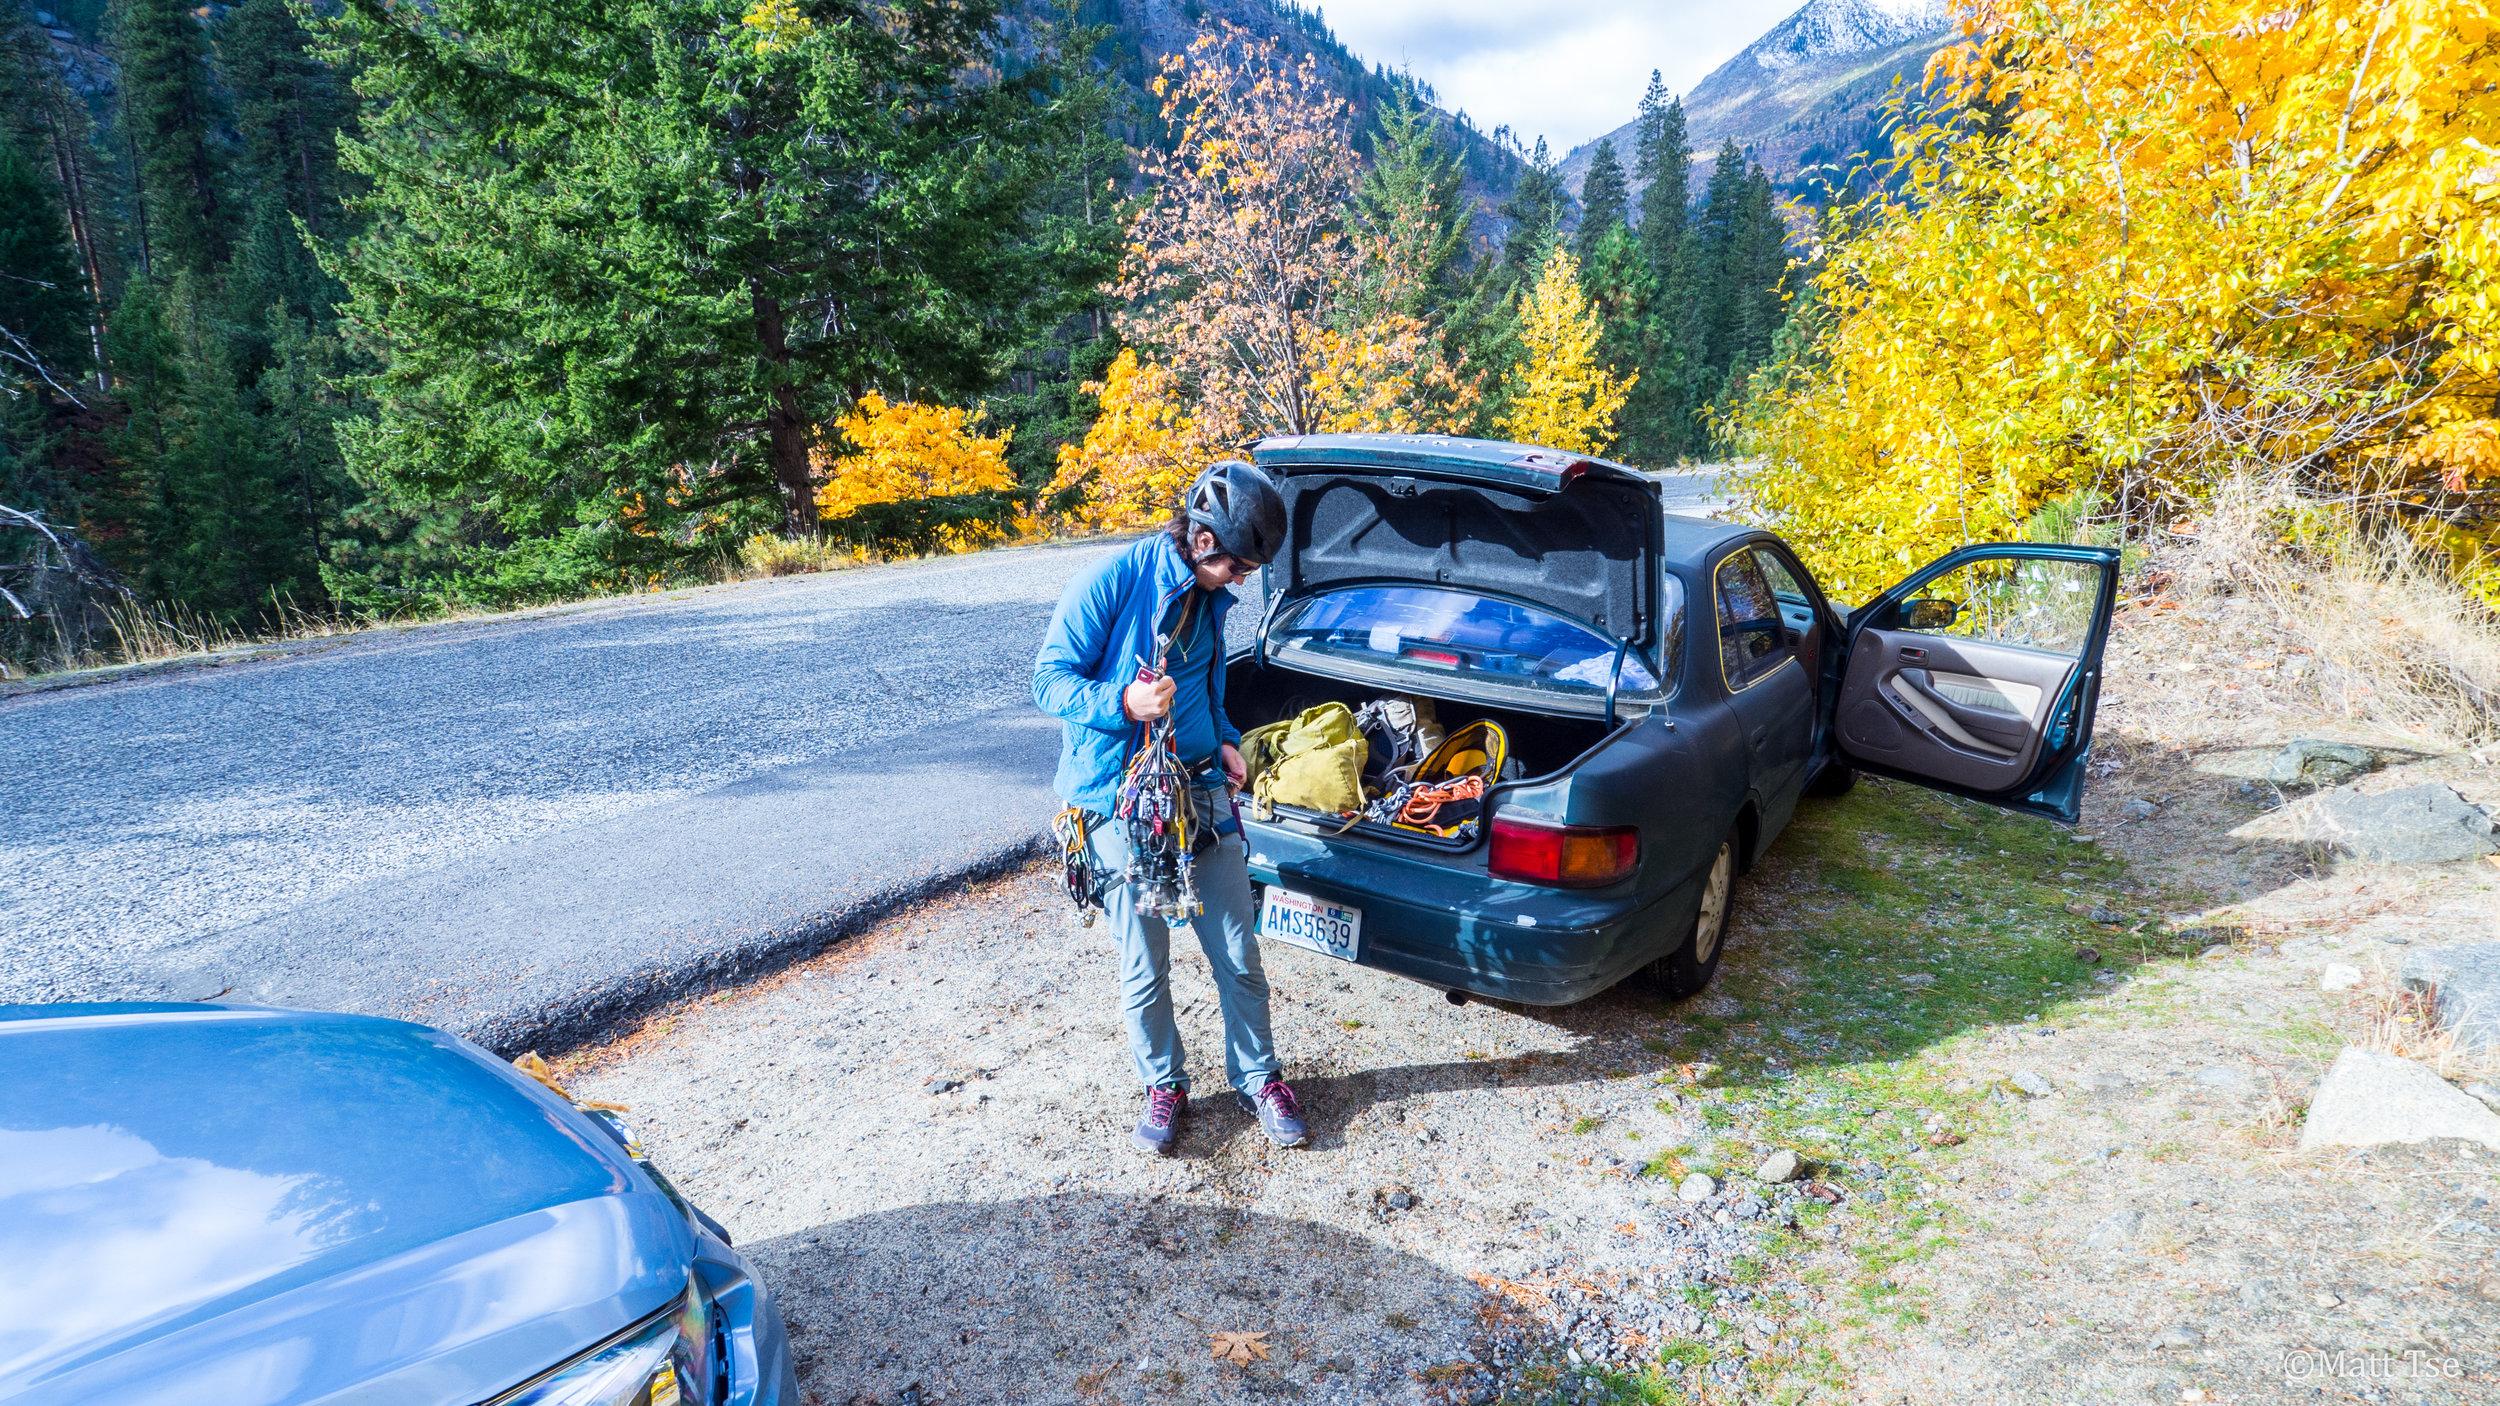 Racking up in Icicle Canyon, Leavenworth, WA